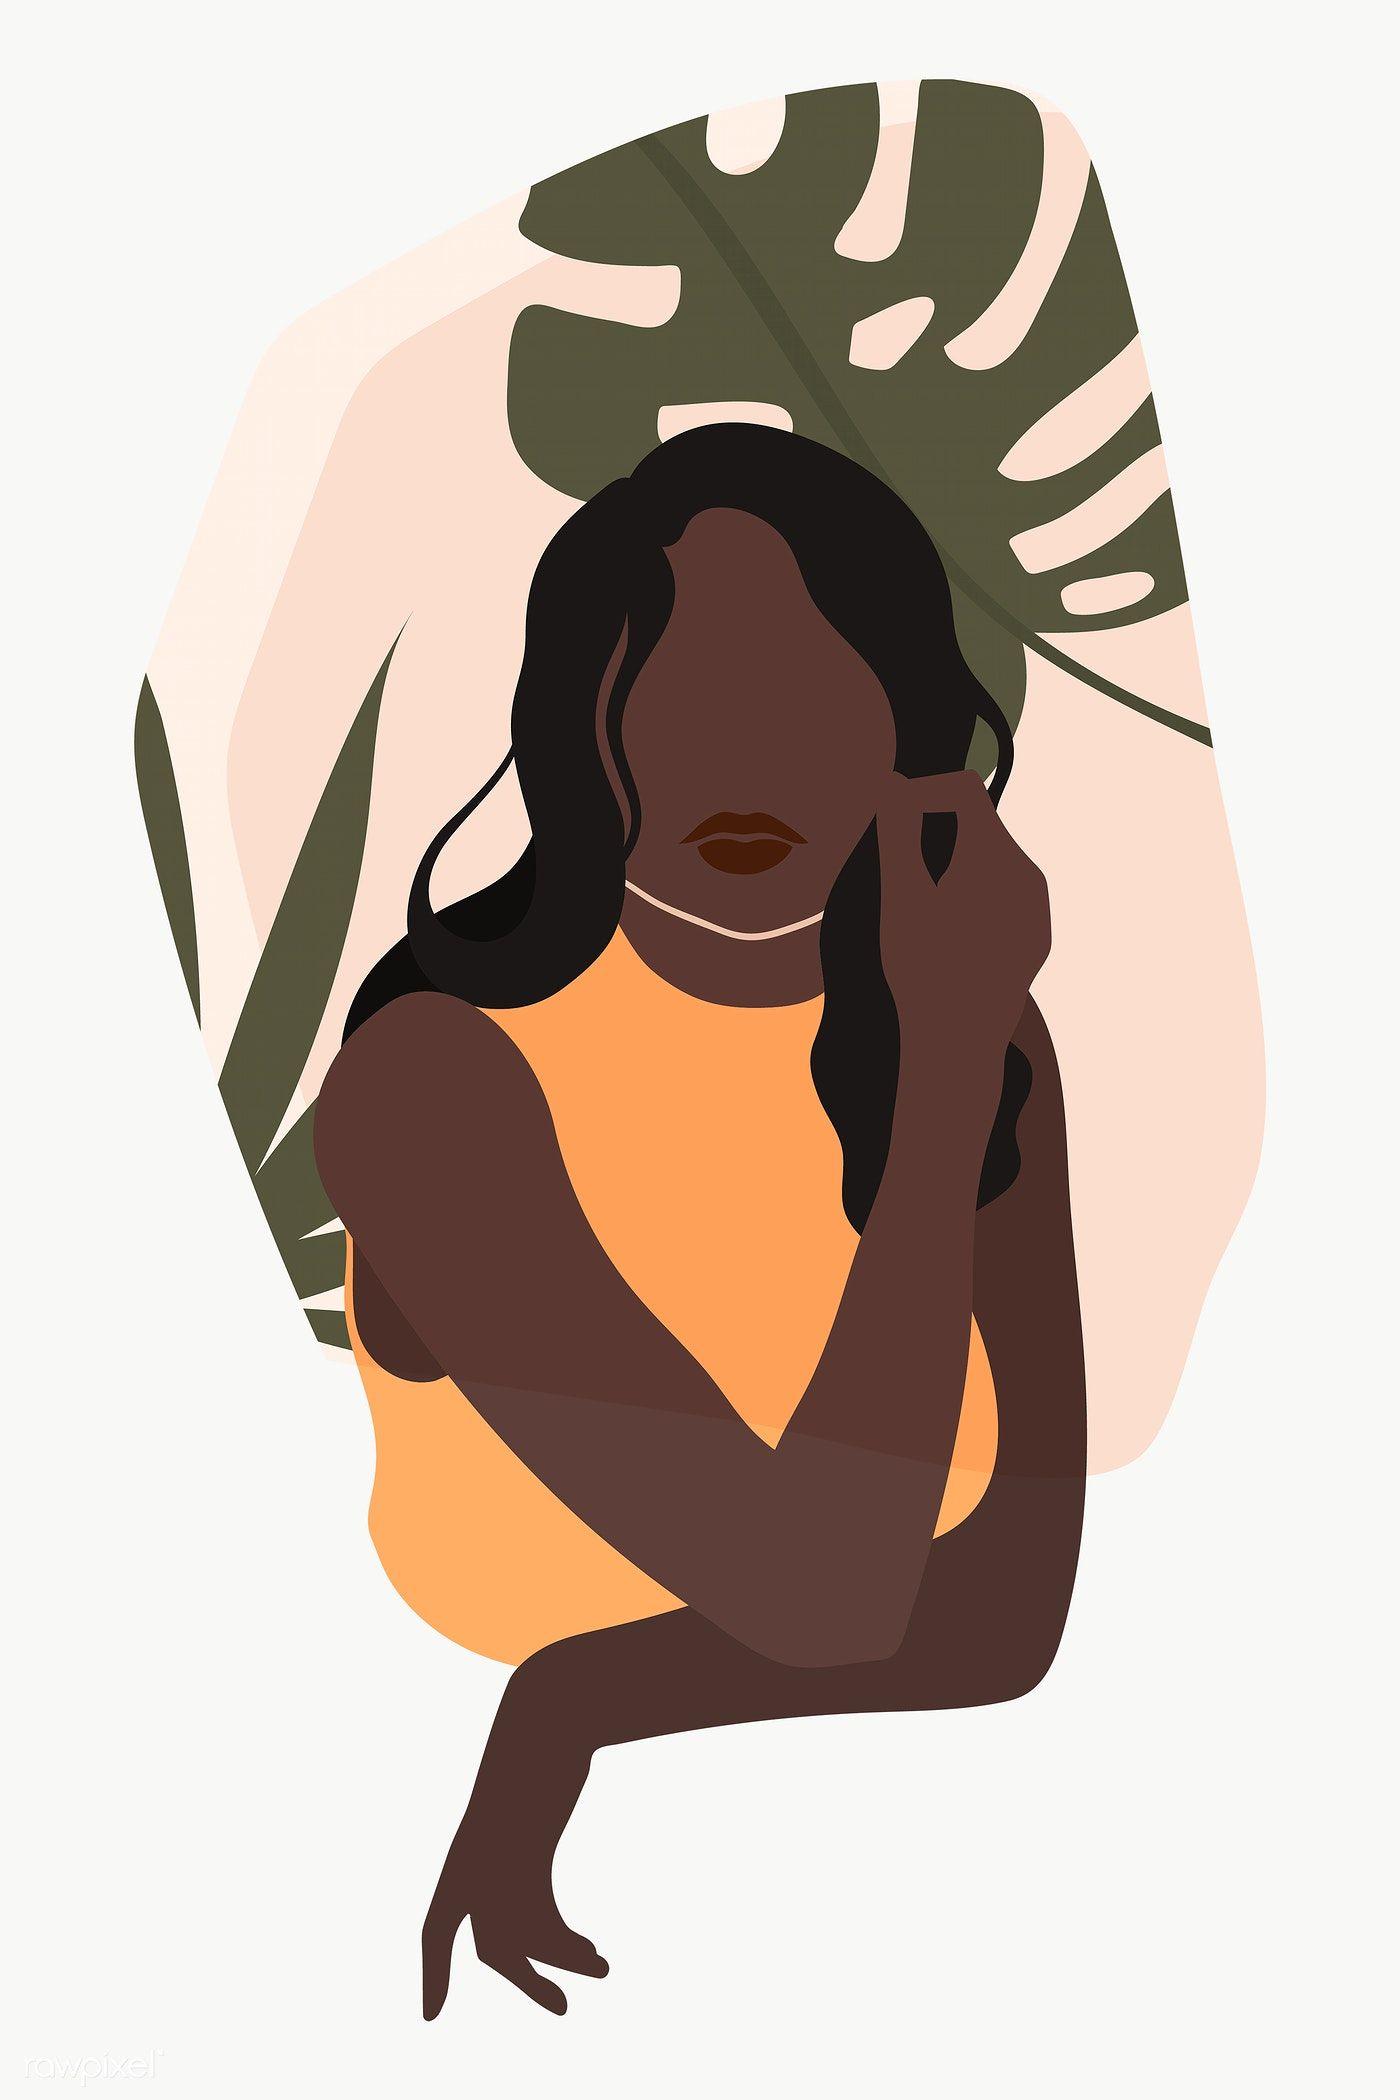 Black Woman With A Monstera Leaf Transparent Png Premium Image By Rawpixel Com Manotang Illustration Art Girl Illustration Art Art